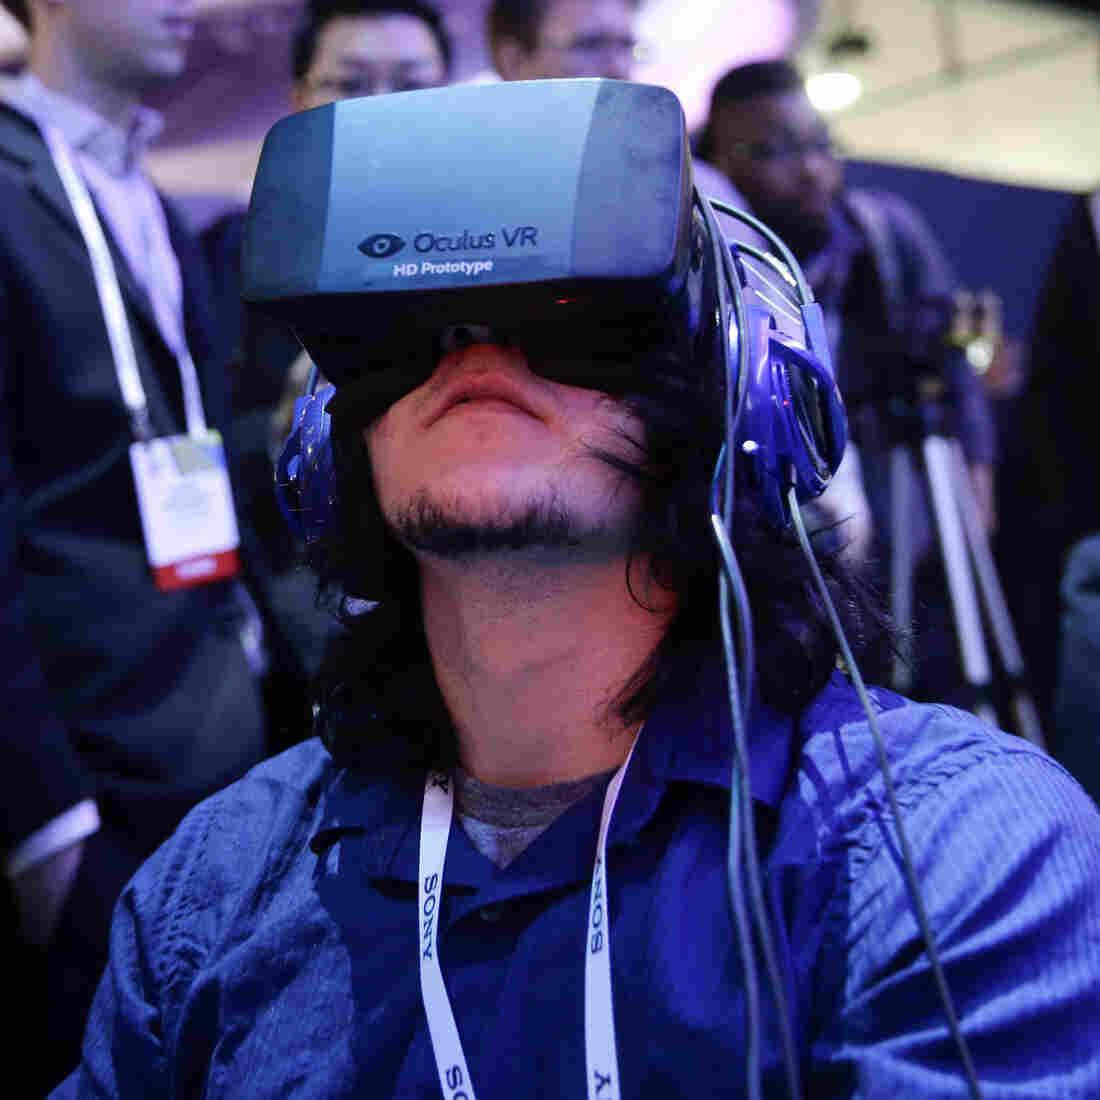 Virtual Reality's Next Hurdle: Overcoming 'Sim Sickness'